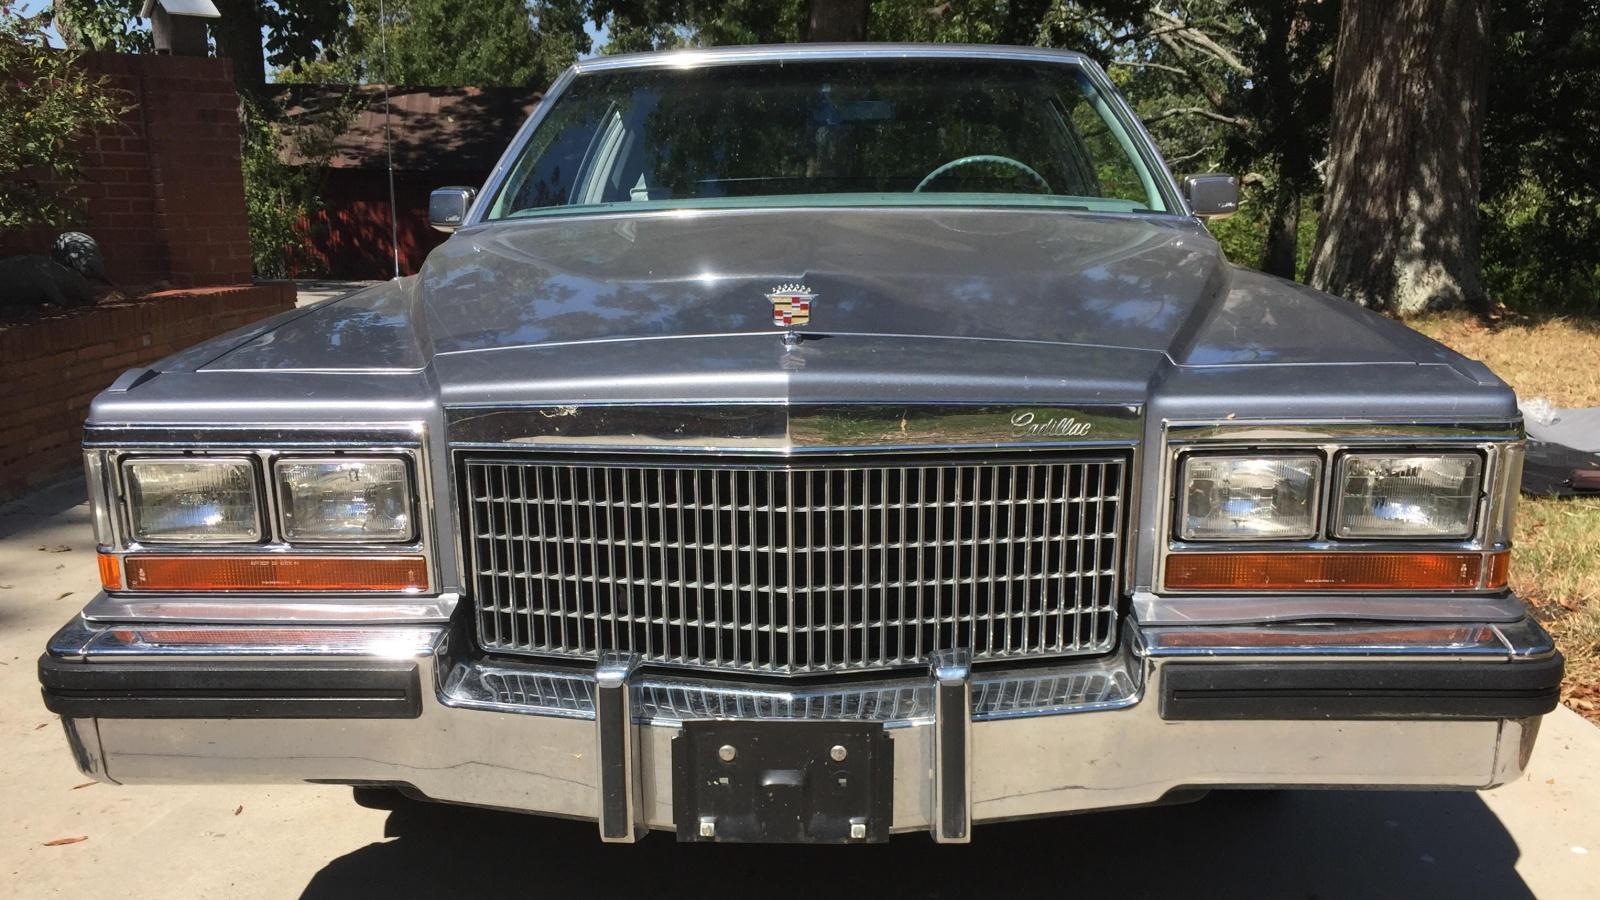 EXCLUSIVE: 40k Mile 1980 Cadillac Coupe DeVille